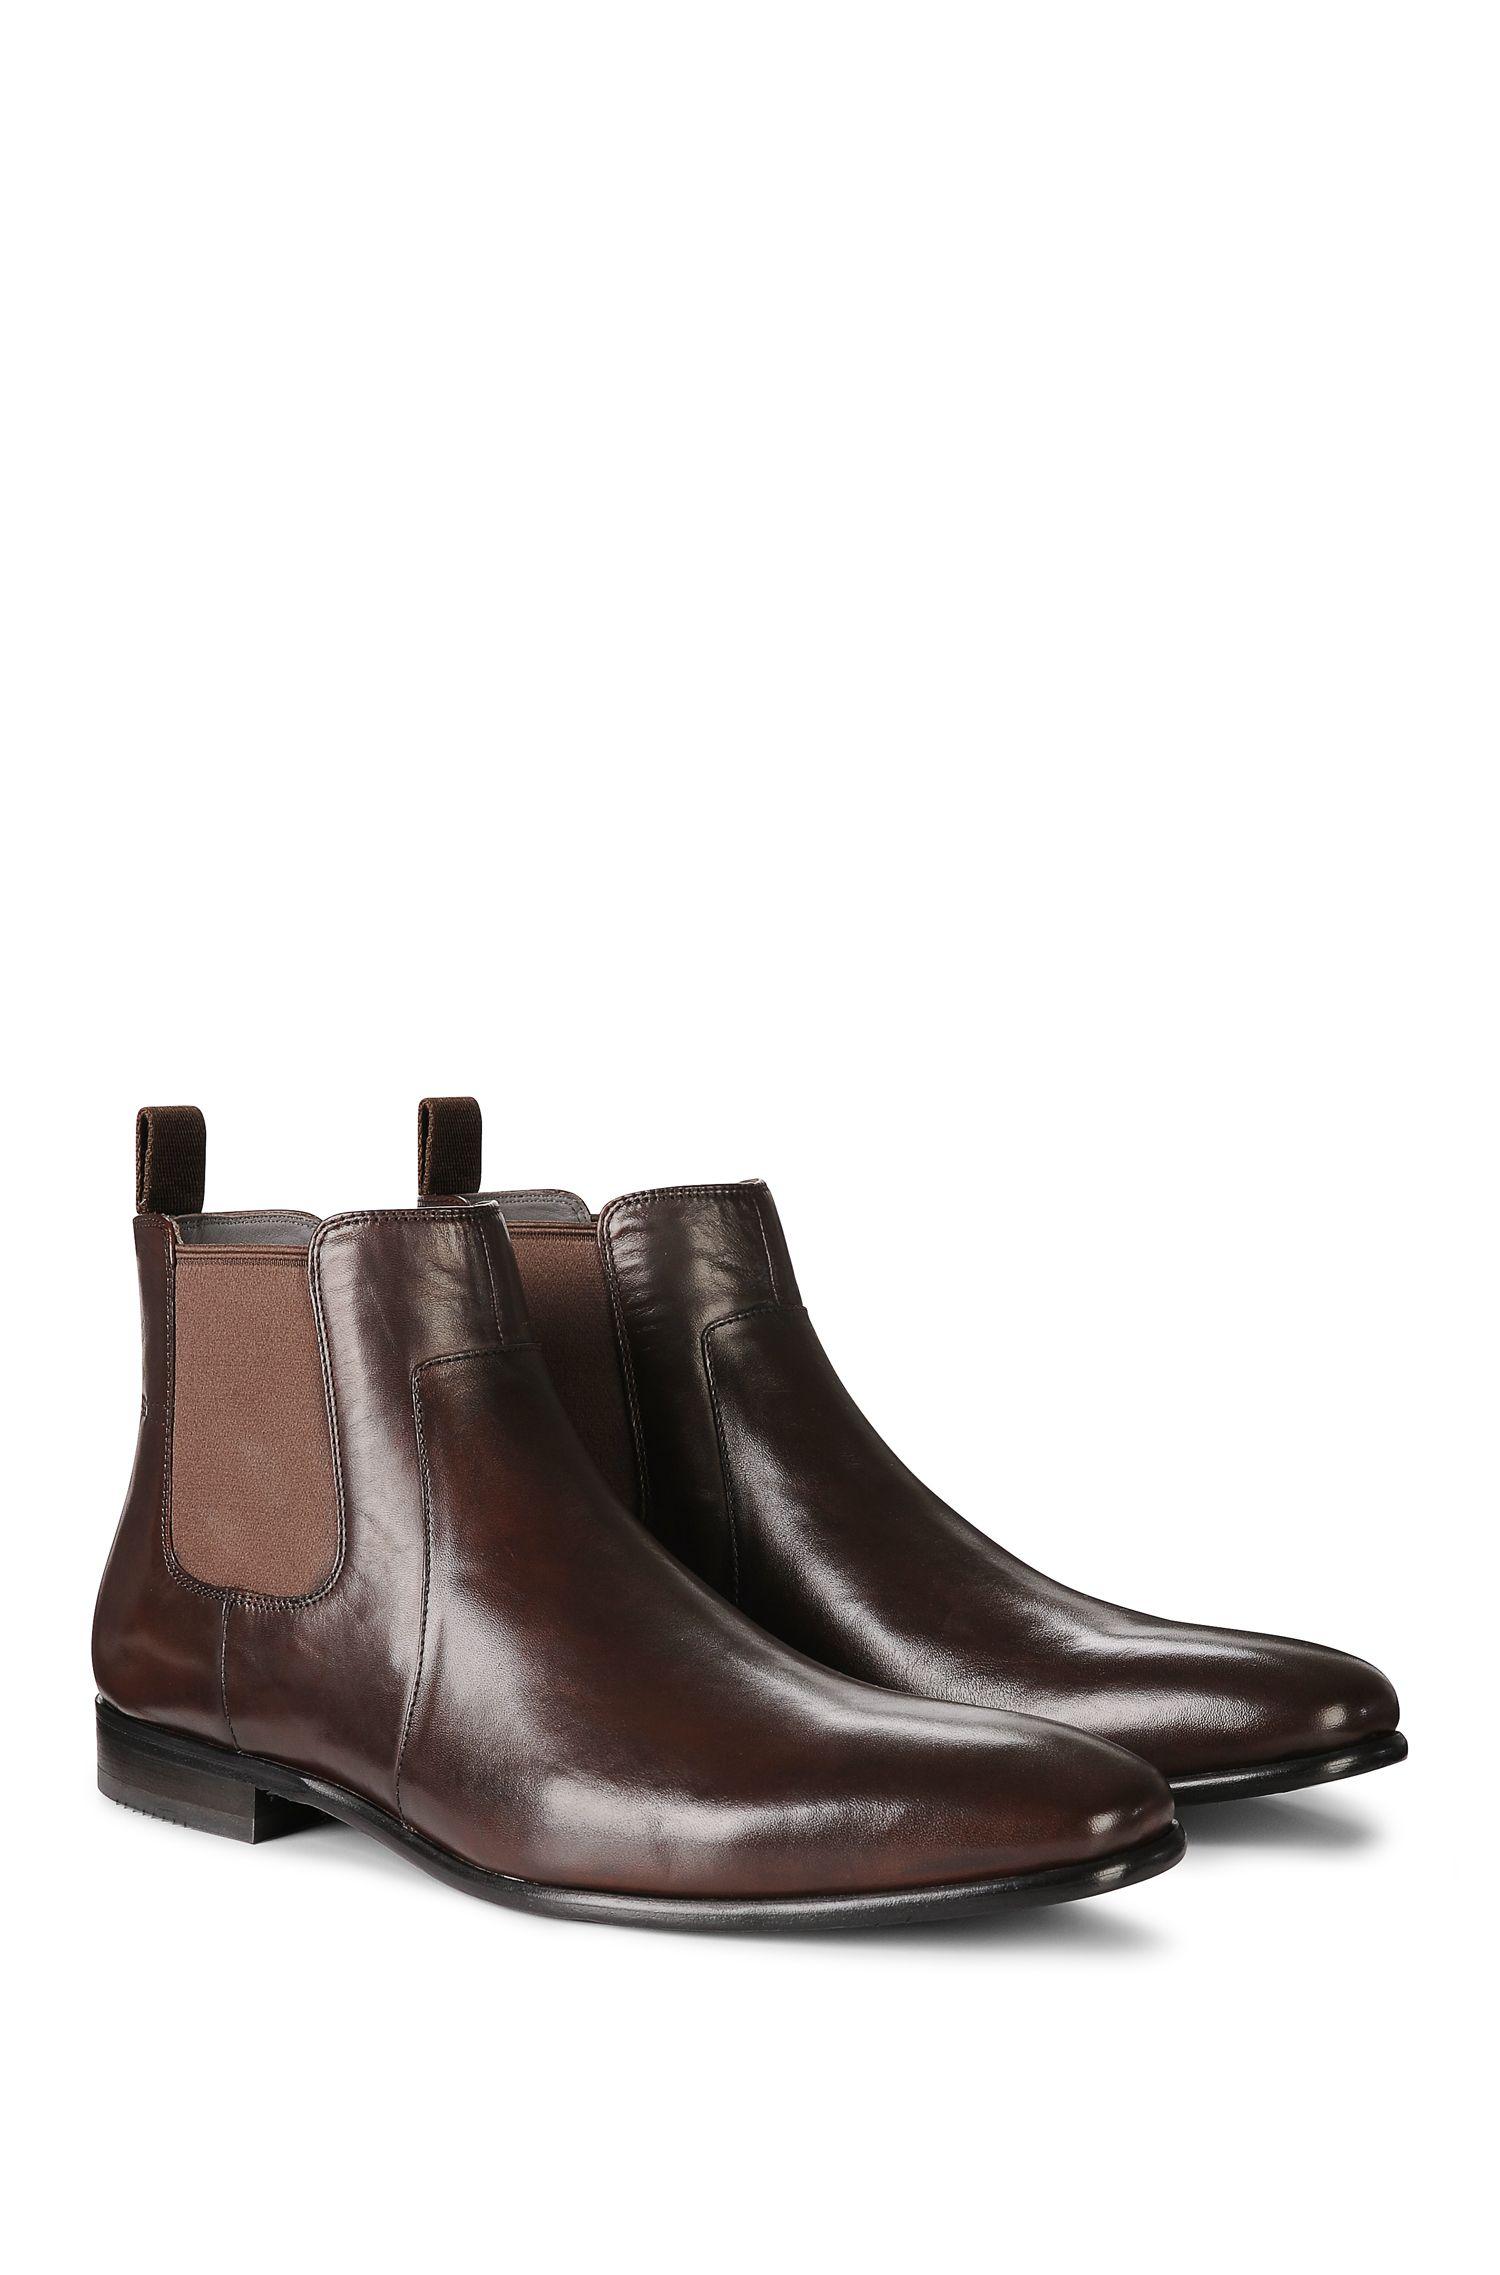 'C-Hubot'   Calfskin Chelsea Boots